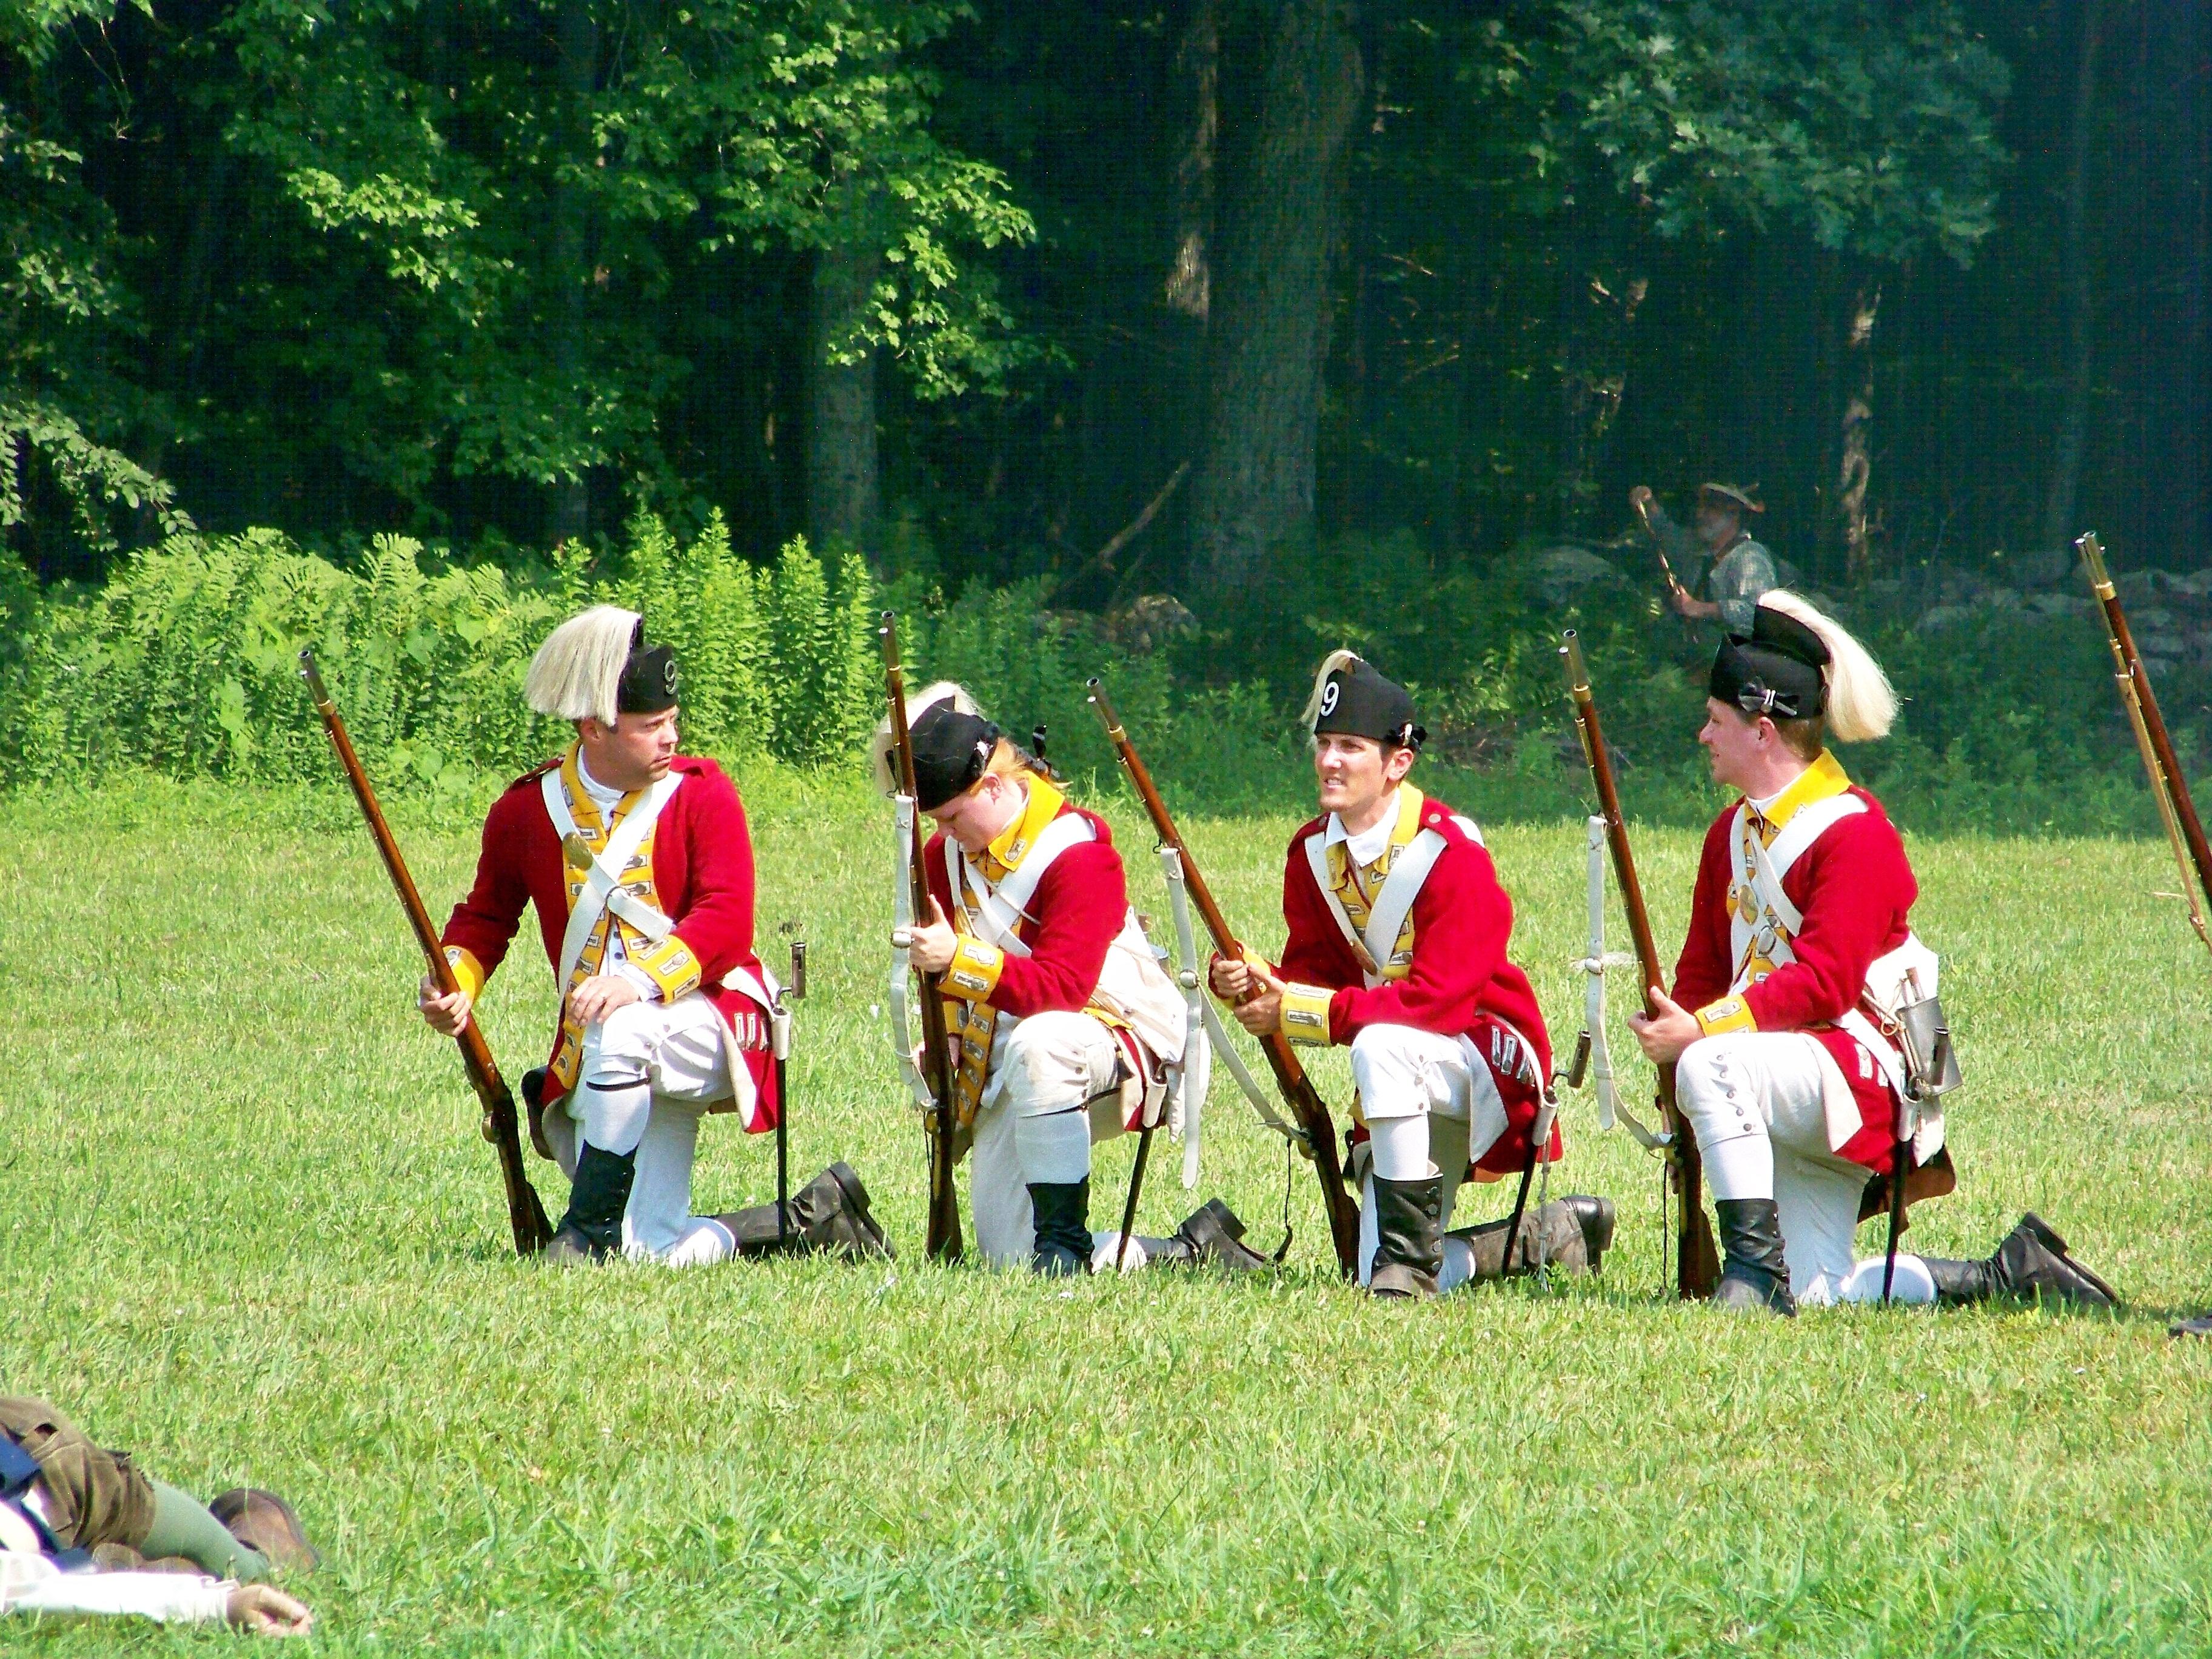 Revolutionary War stock 084 by dragon-orb